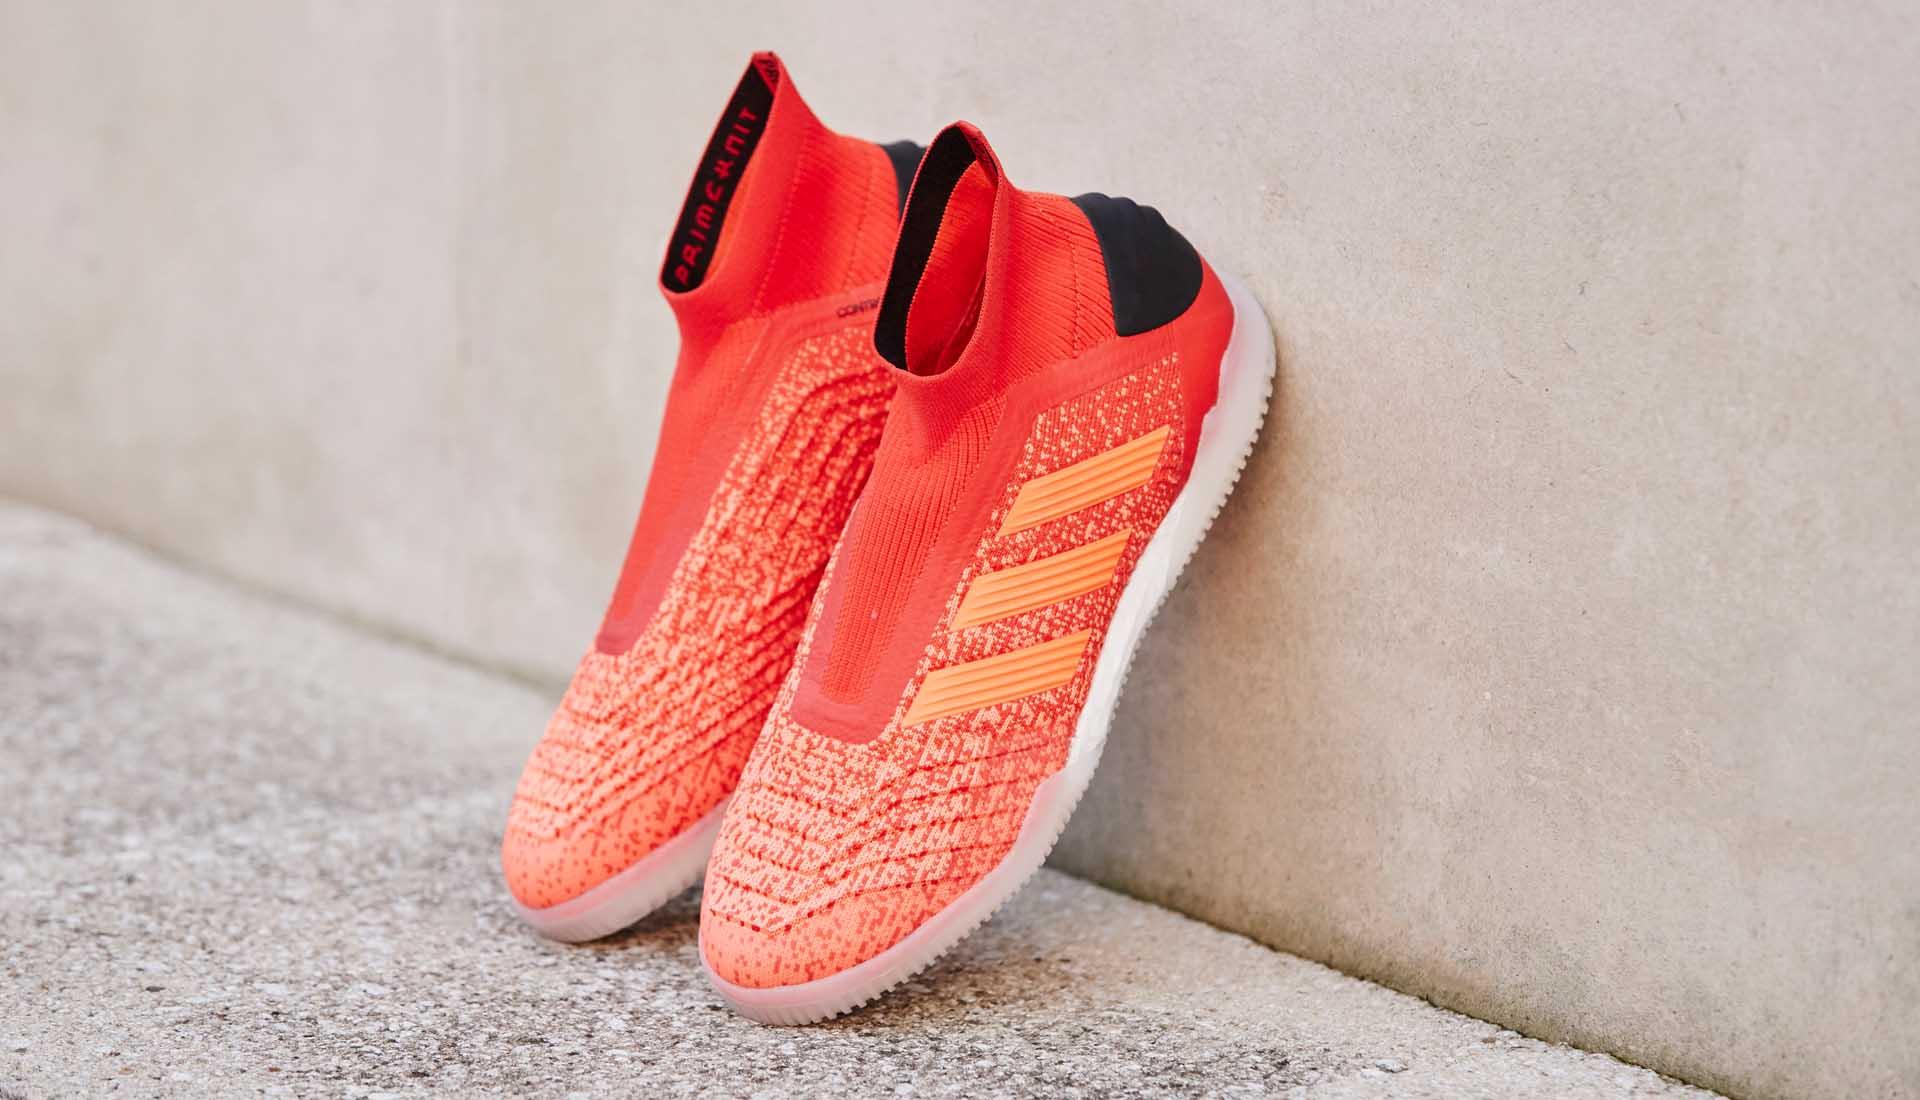 newest 88a0a eb84d 6-adidas-predator-initiator-red-tango-min.jpg